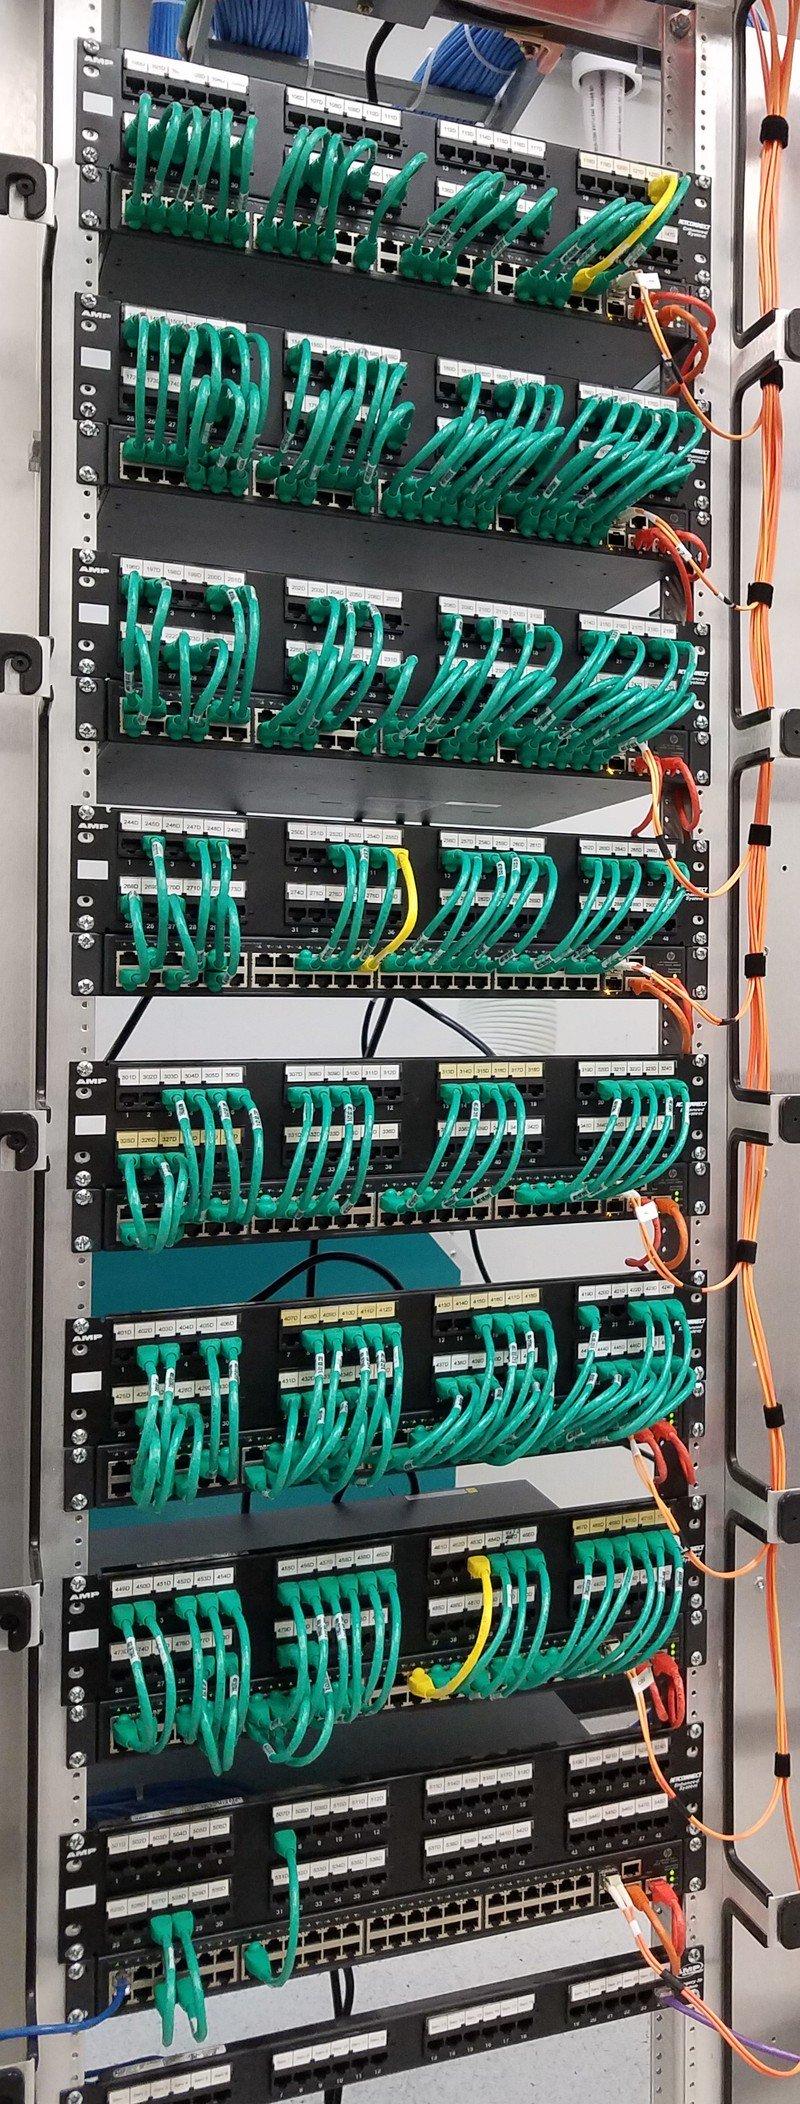 medium resolution of wiring a network rack wiring diagram data val wiring a network rack